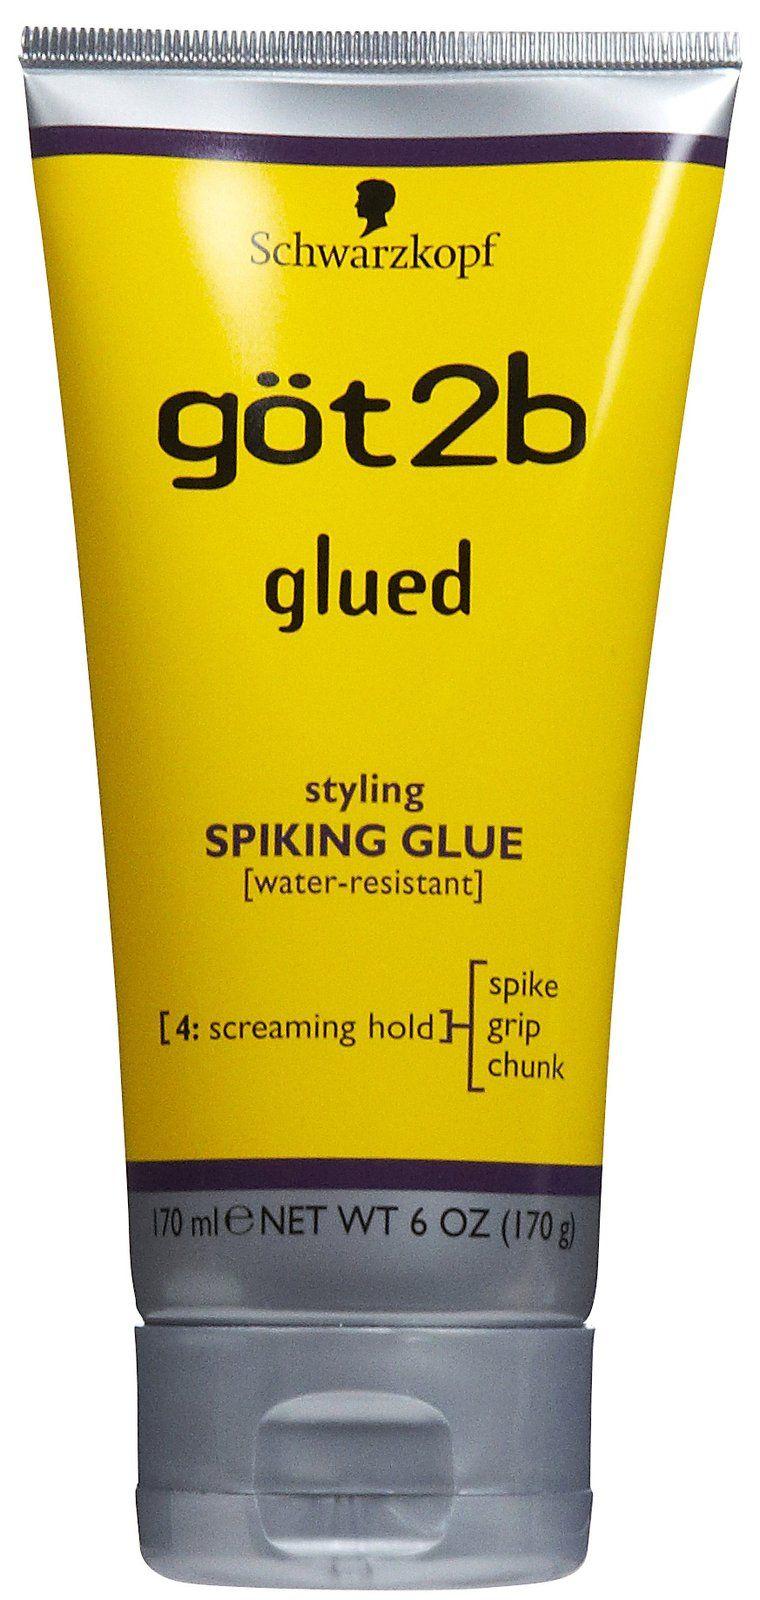 Got2b Glued Styling Spiking Glue Got2b Glued Hair Glue Got2b